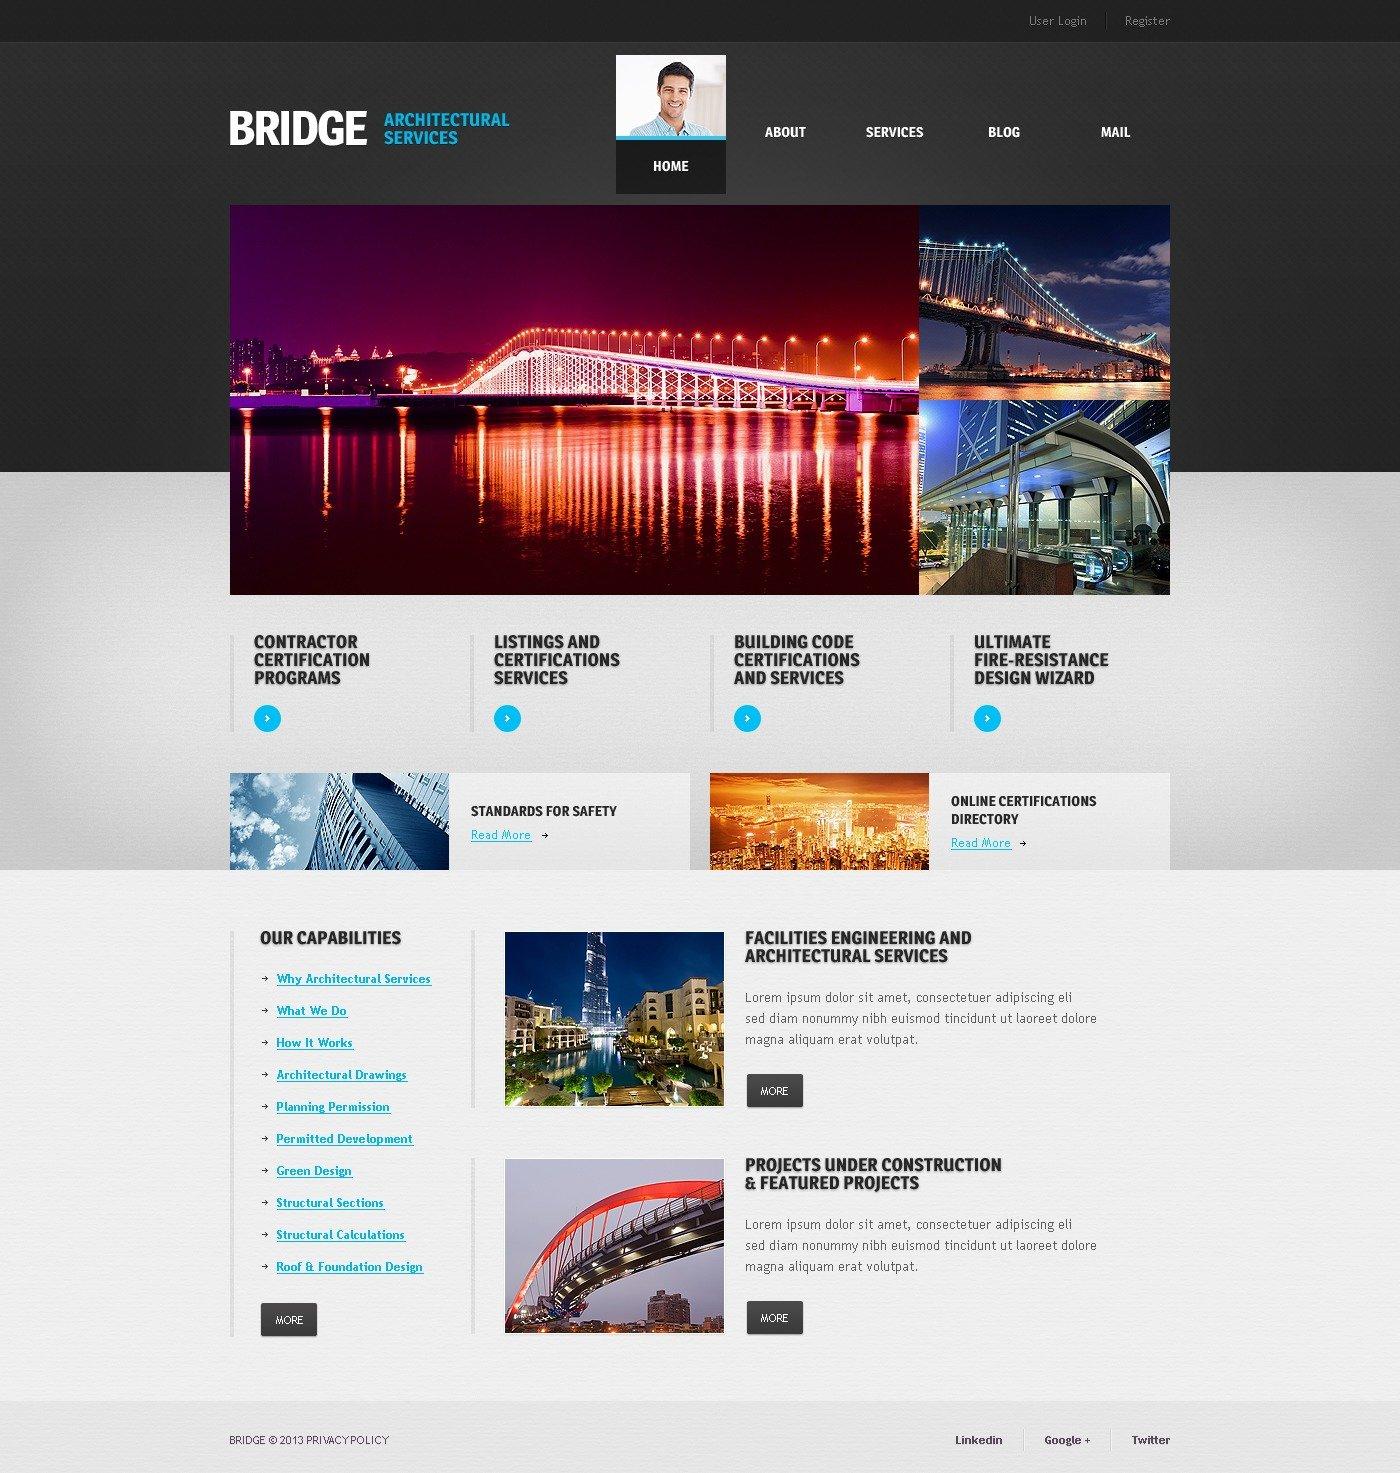 rchitectural Services Joomla emplate #44988 - ^